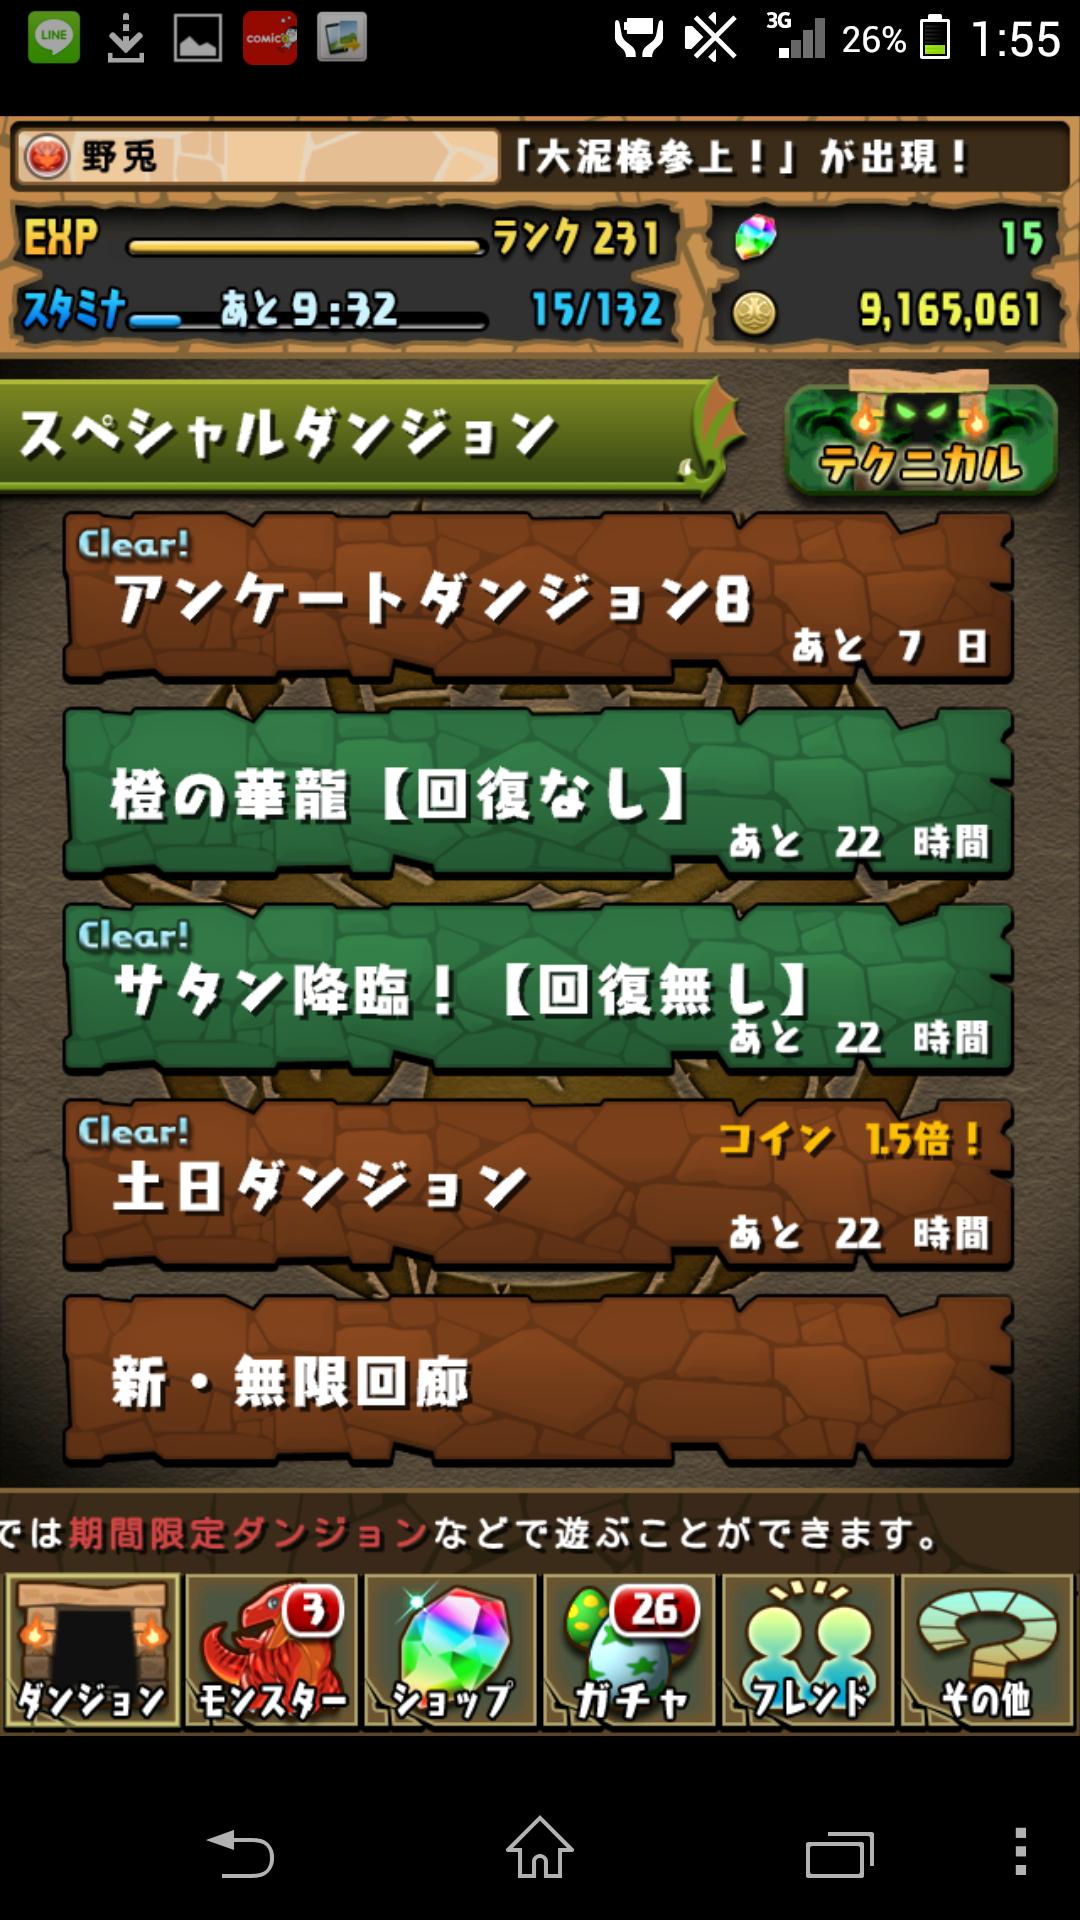 Screenshot_2014-04-20-01-55-50.png